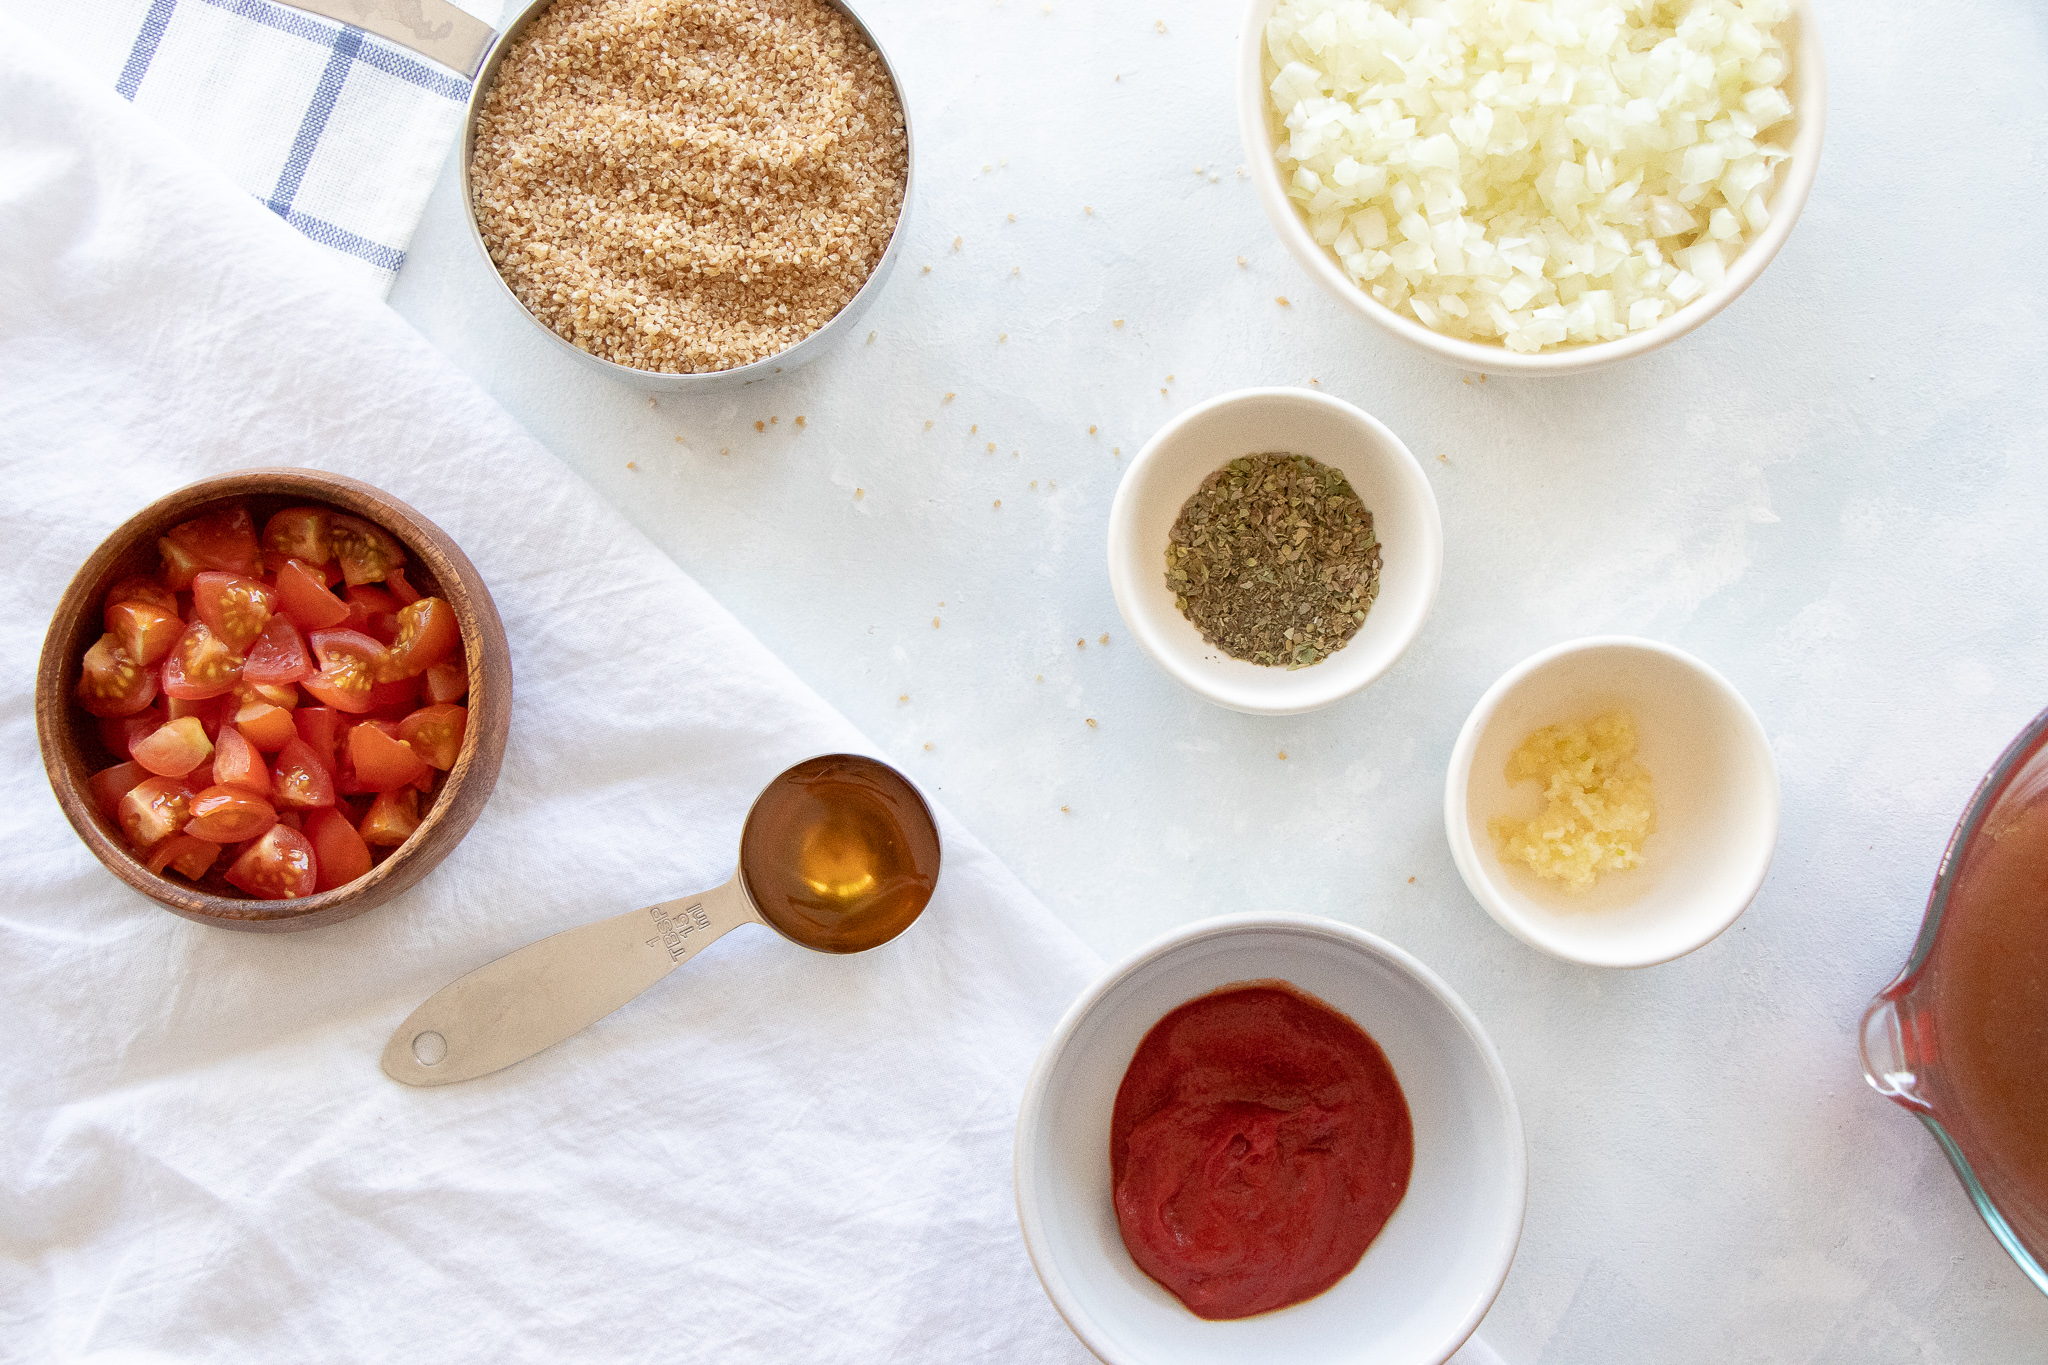 Wild rice pilaf ingredients